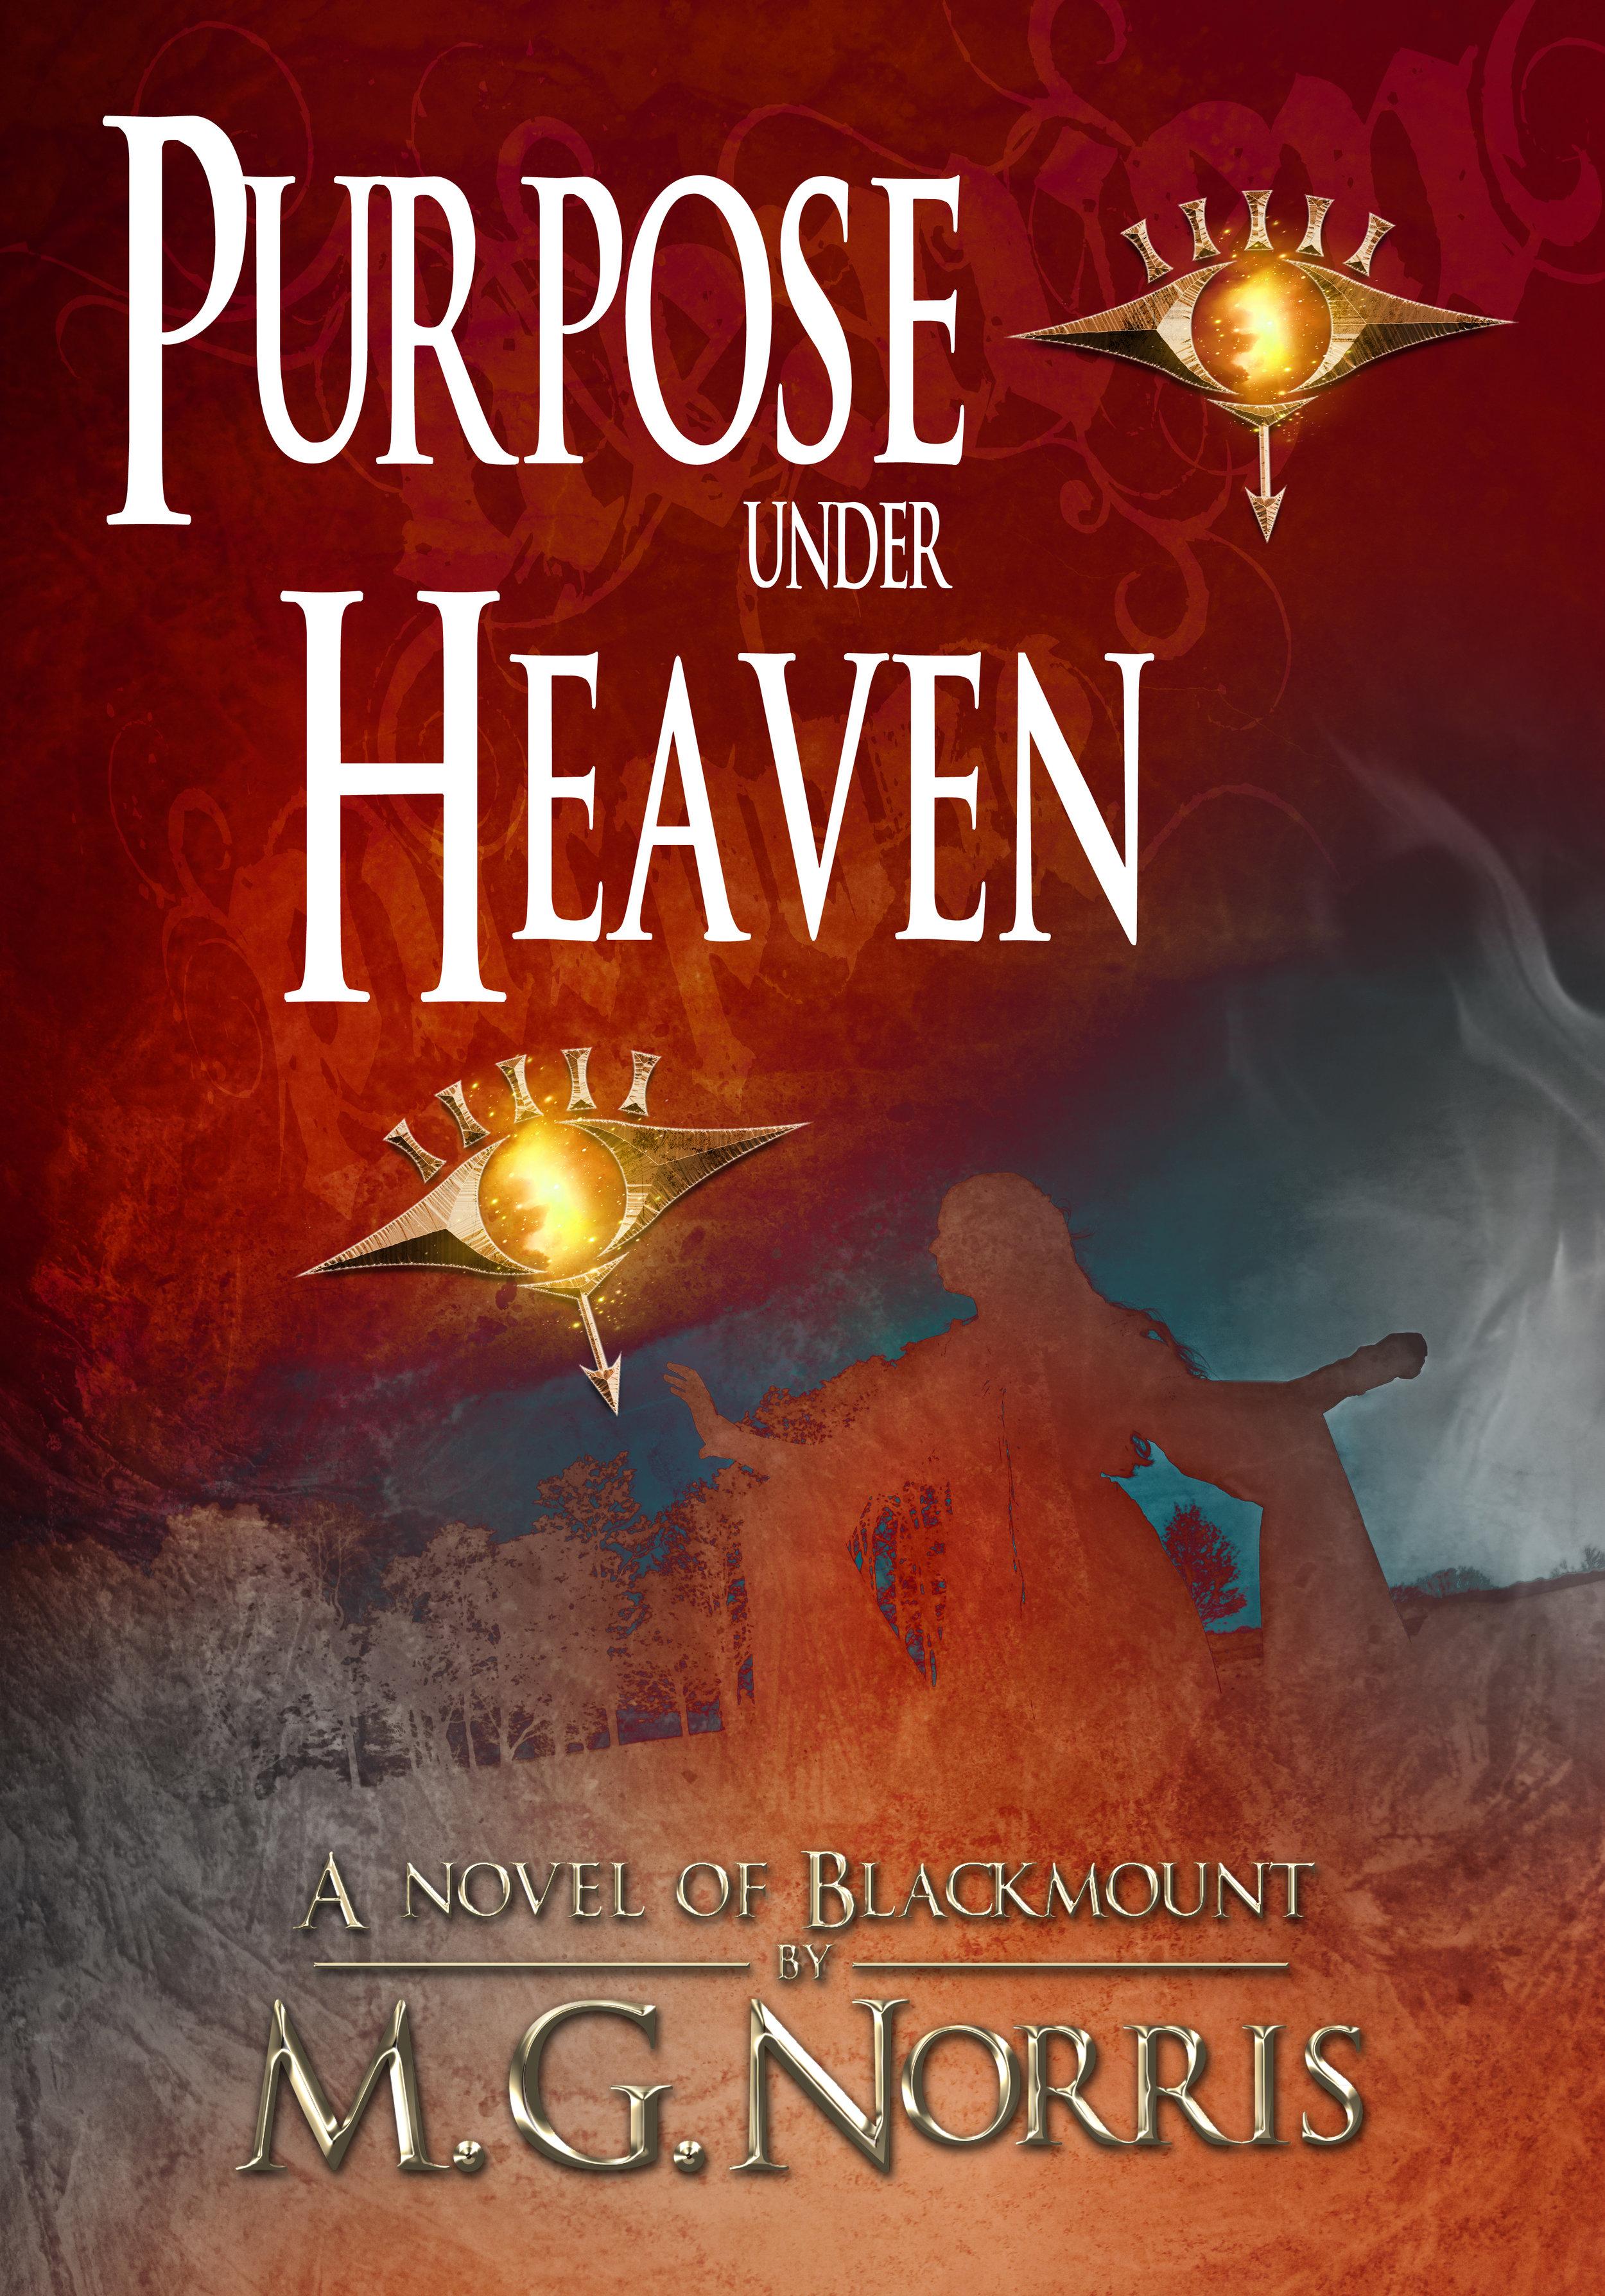 Blackmount Book 4 - Purpose Under Heaven  release date - tbd